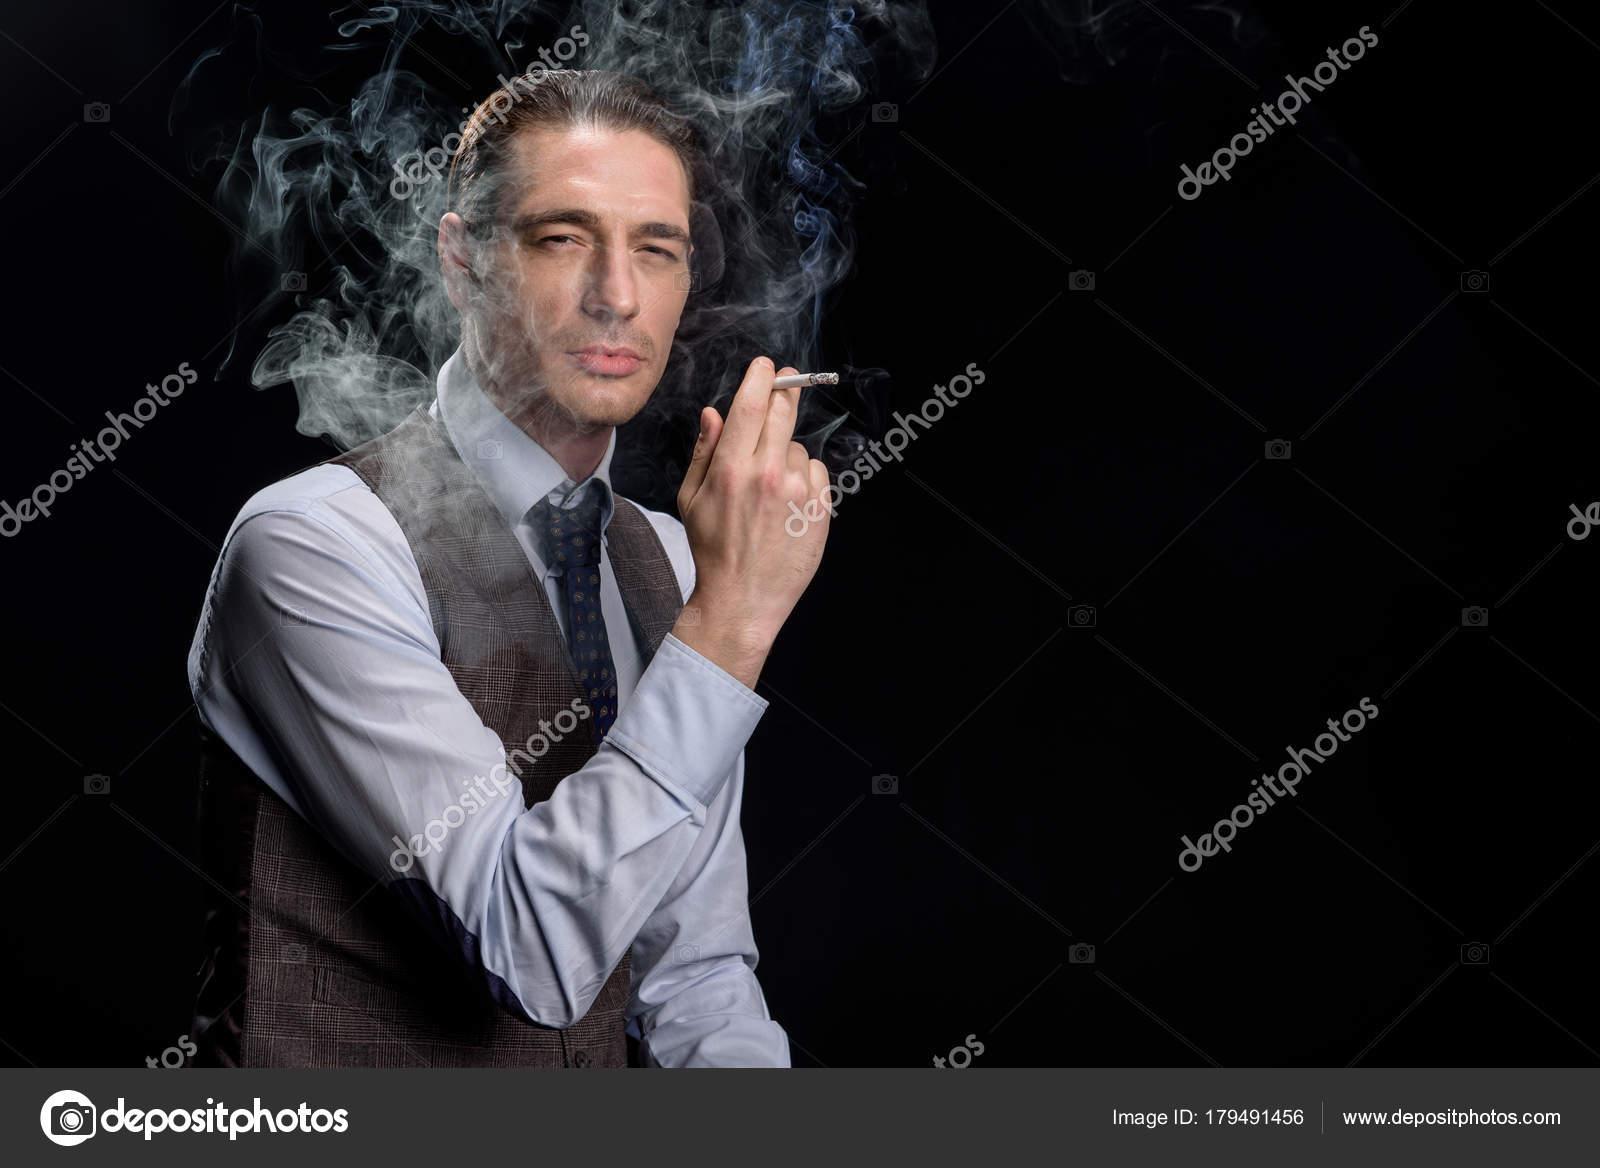 Elegant Businessman Is Enjoying Unhealthy Habit Stock Photo